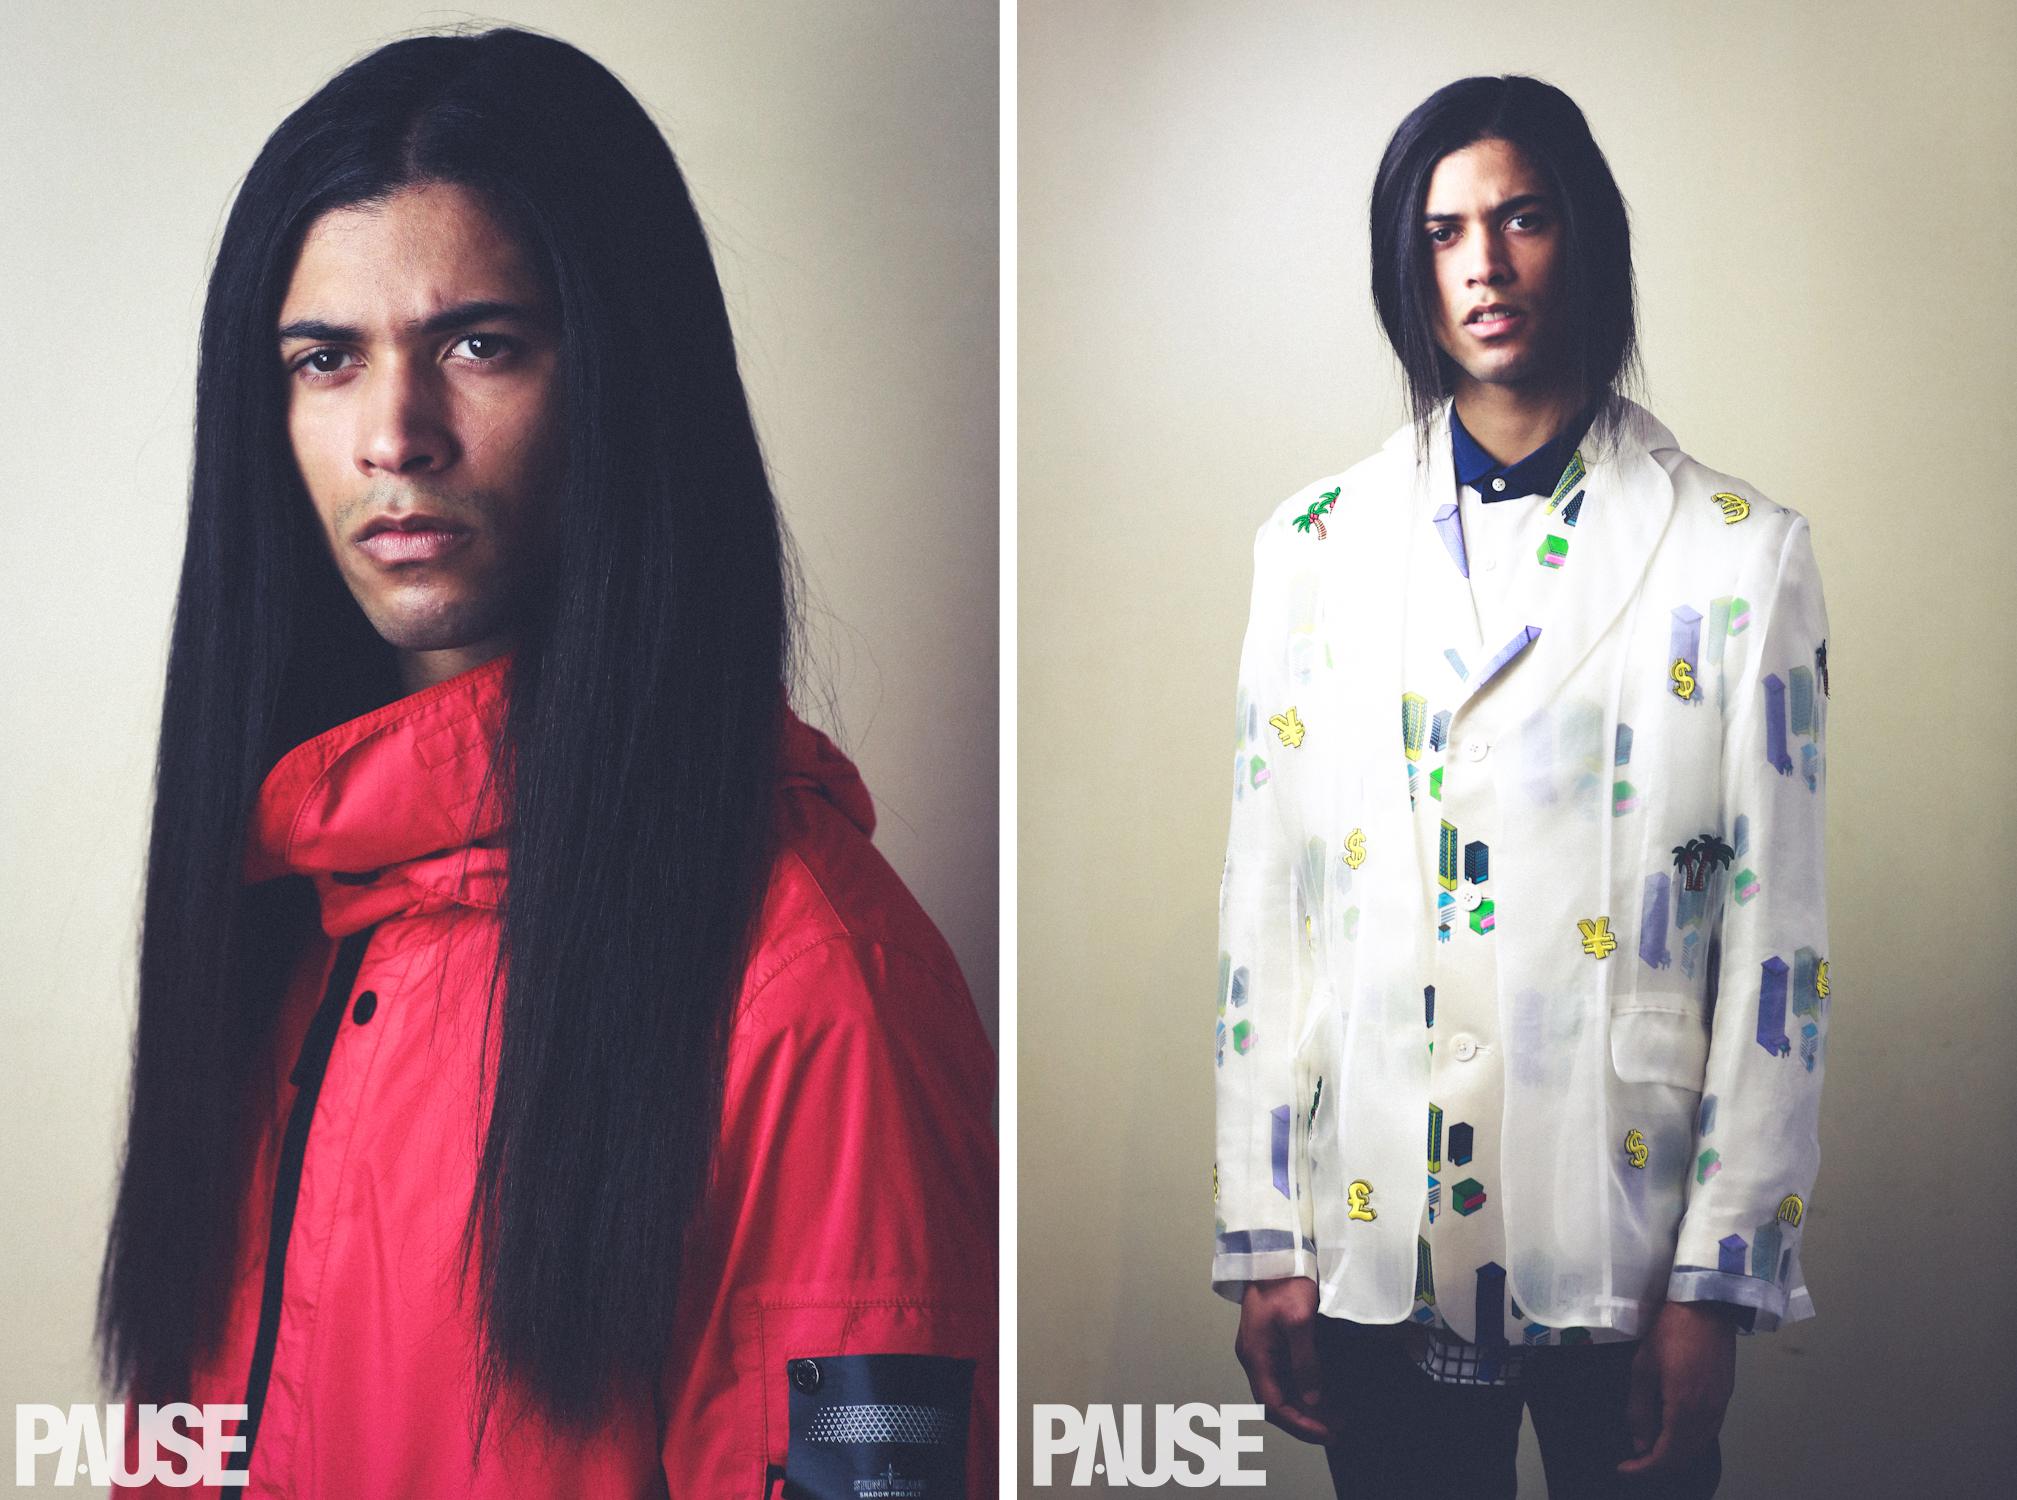 PAUSE Hair: Straighten Up